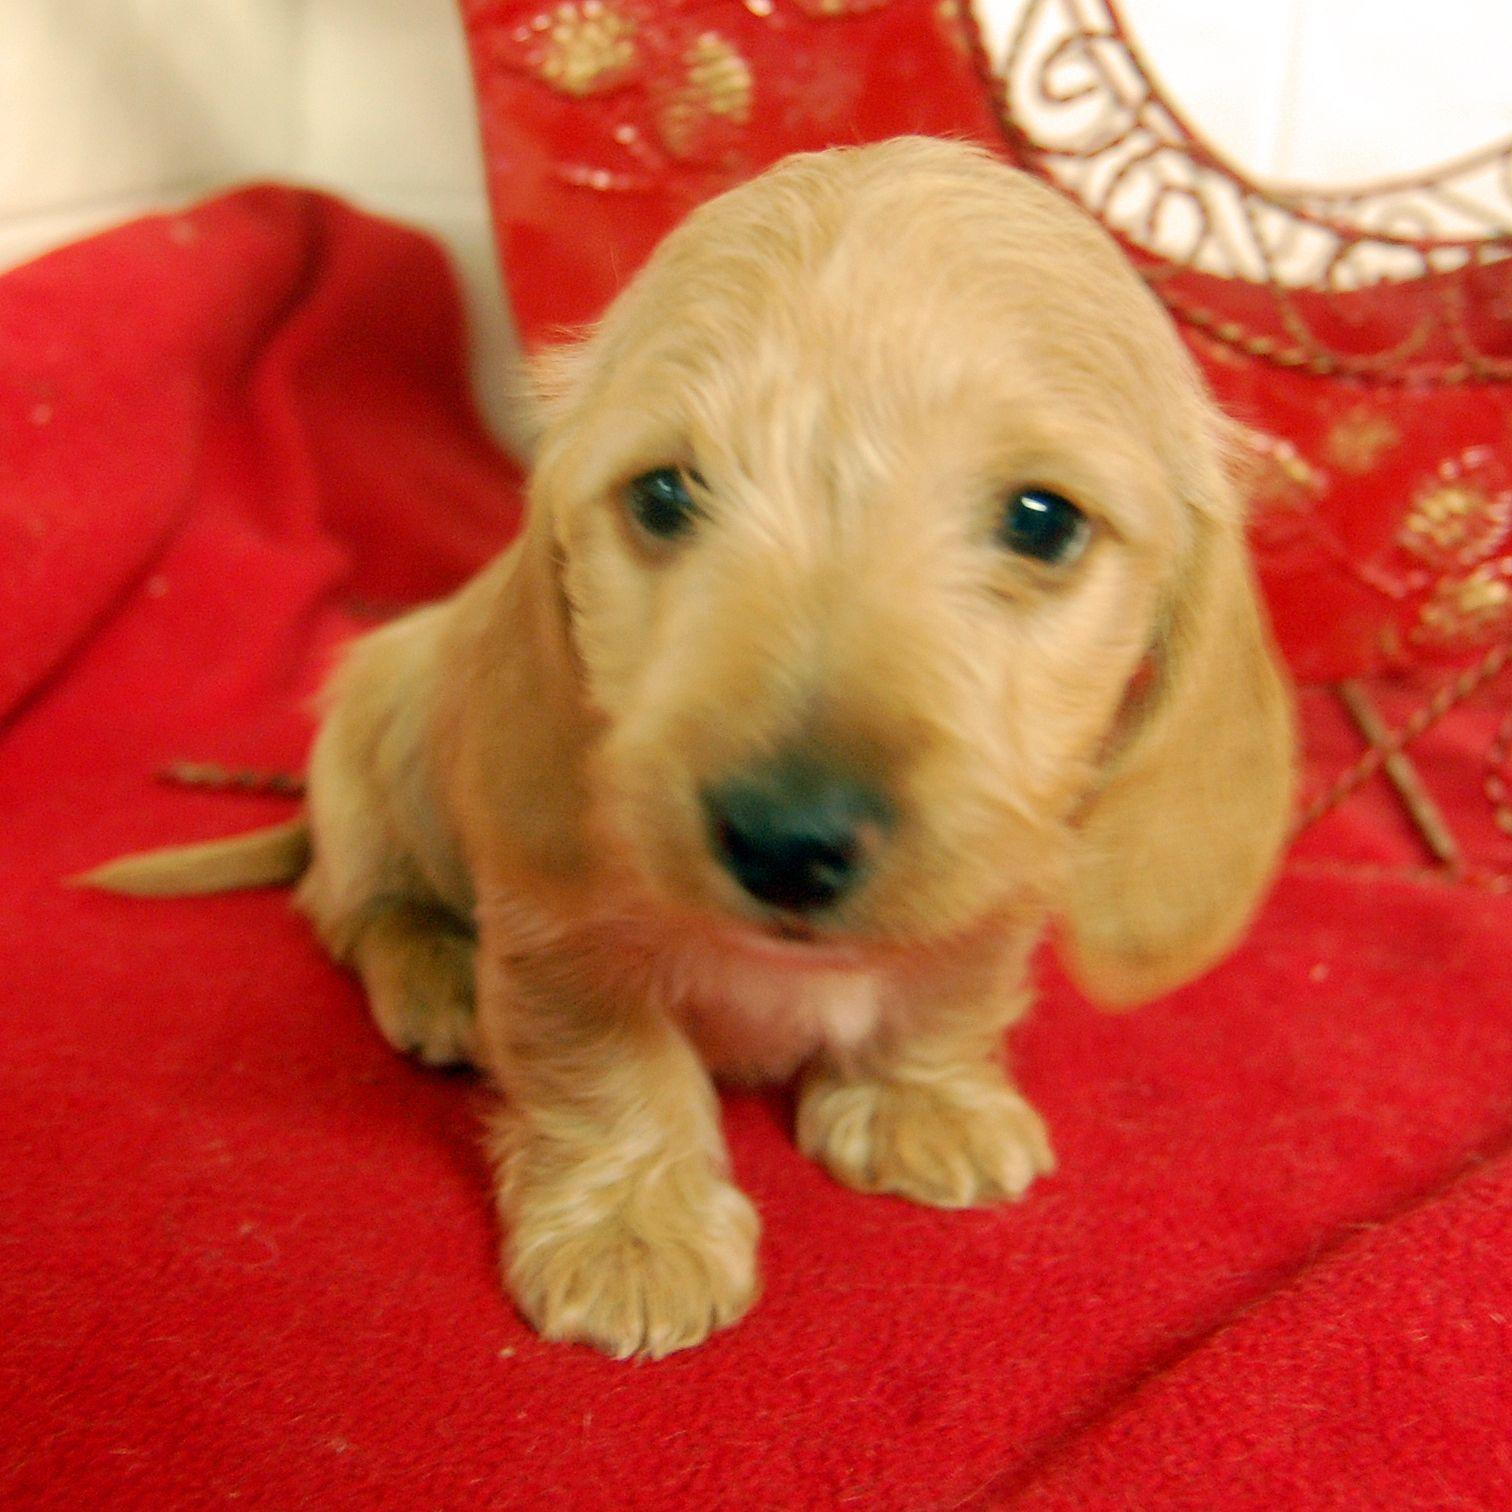 Miniature Dachshund Puppies Dachshund puppy miniature